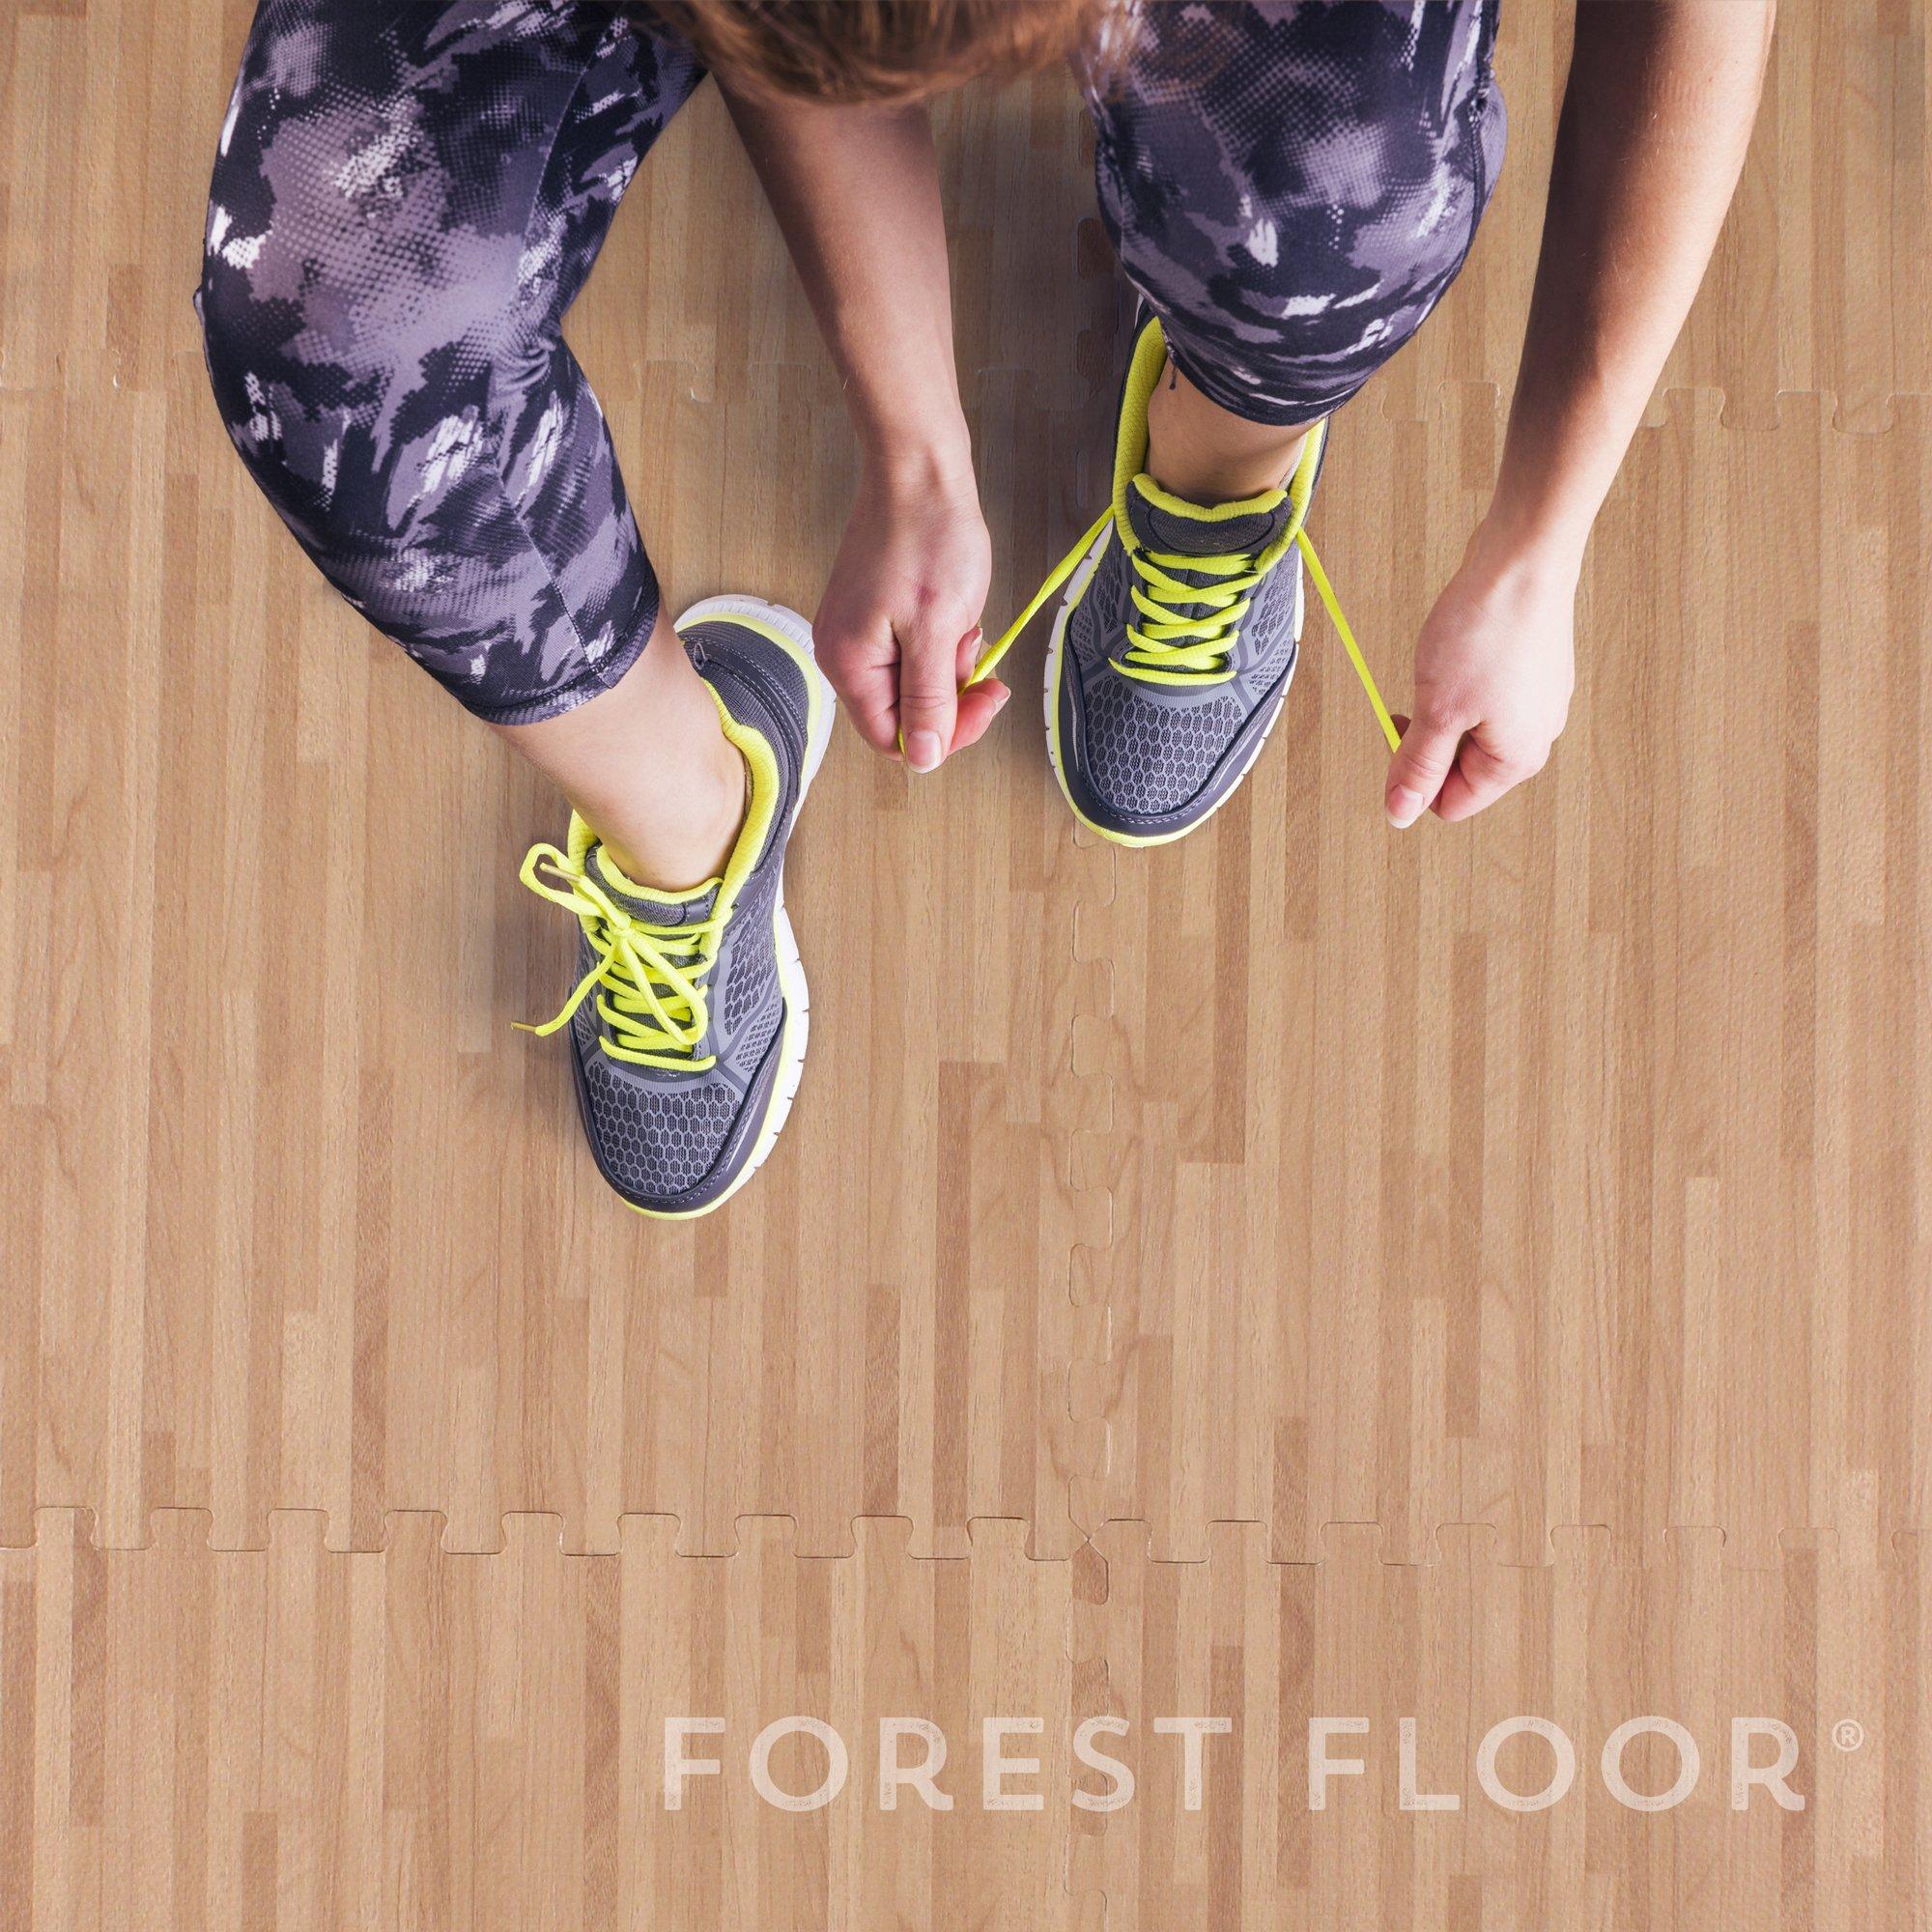 Forest Floor 3/8'' Thick Printed Wood Grain Interlocking Foam Floor Mats, 16 Sq Ft (4 Tiles), White Oak by Forest Floor (Image #6)